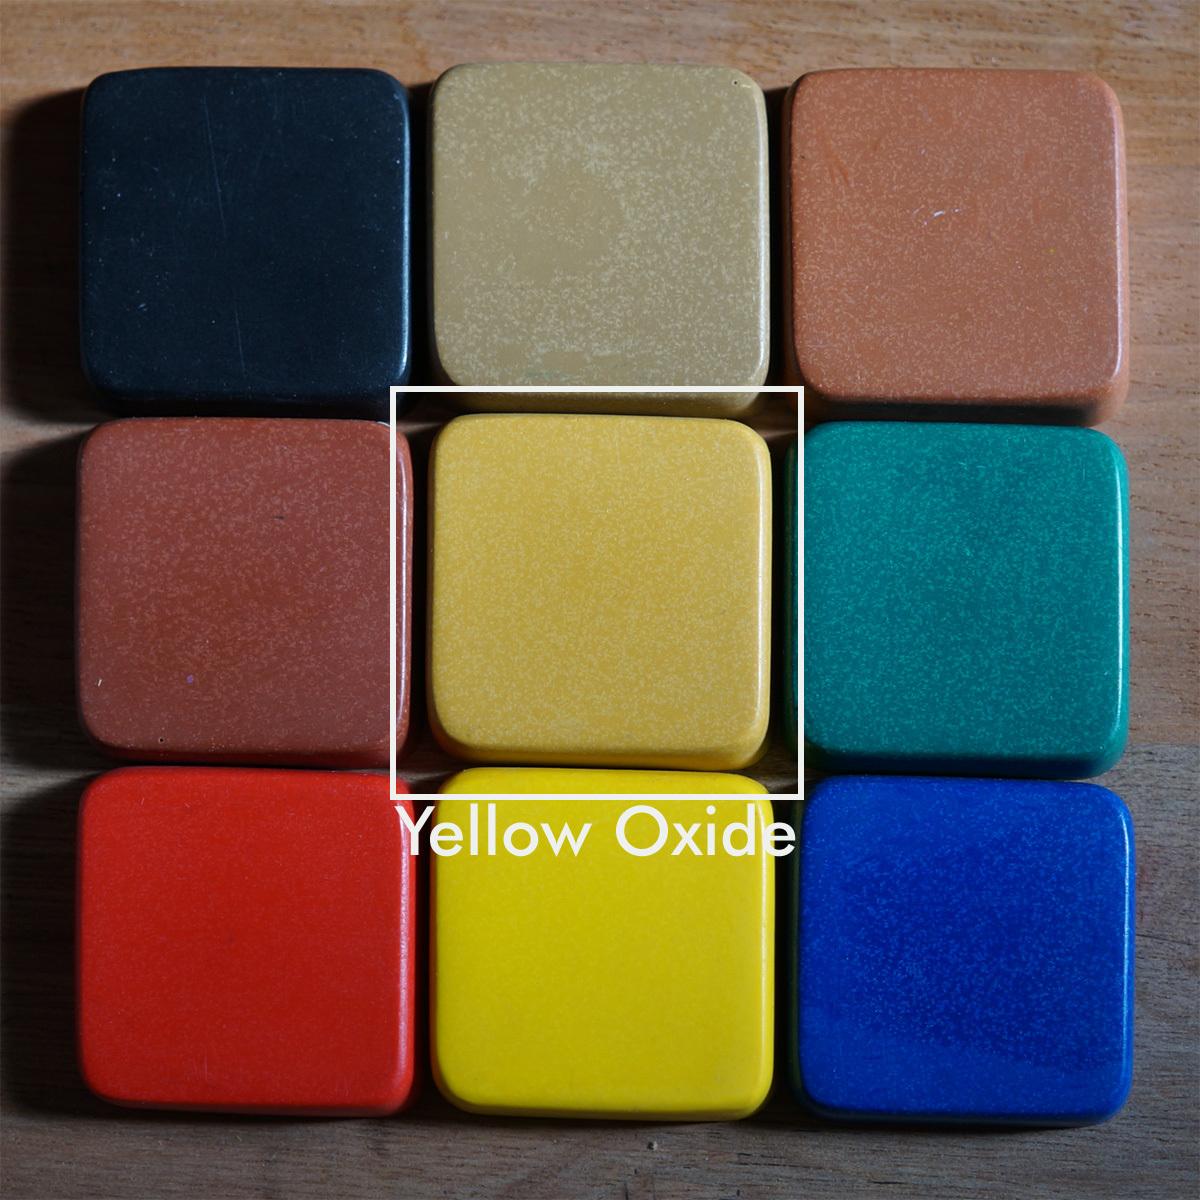 PIGMENT YELLOW OXIDE 300g(着色剤:イエローオキソイド 300g) - 画像2